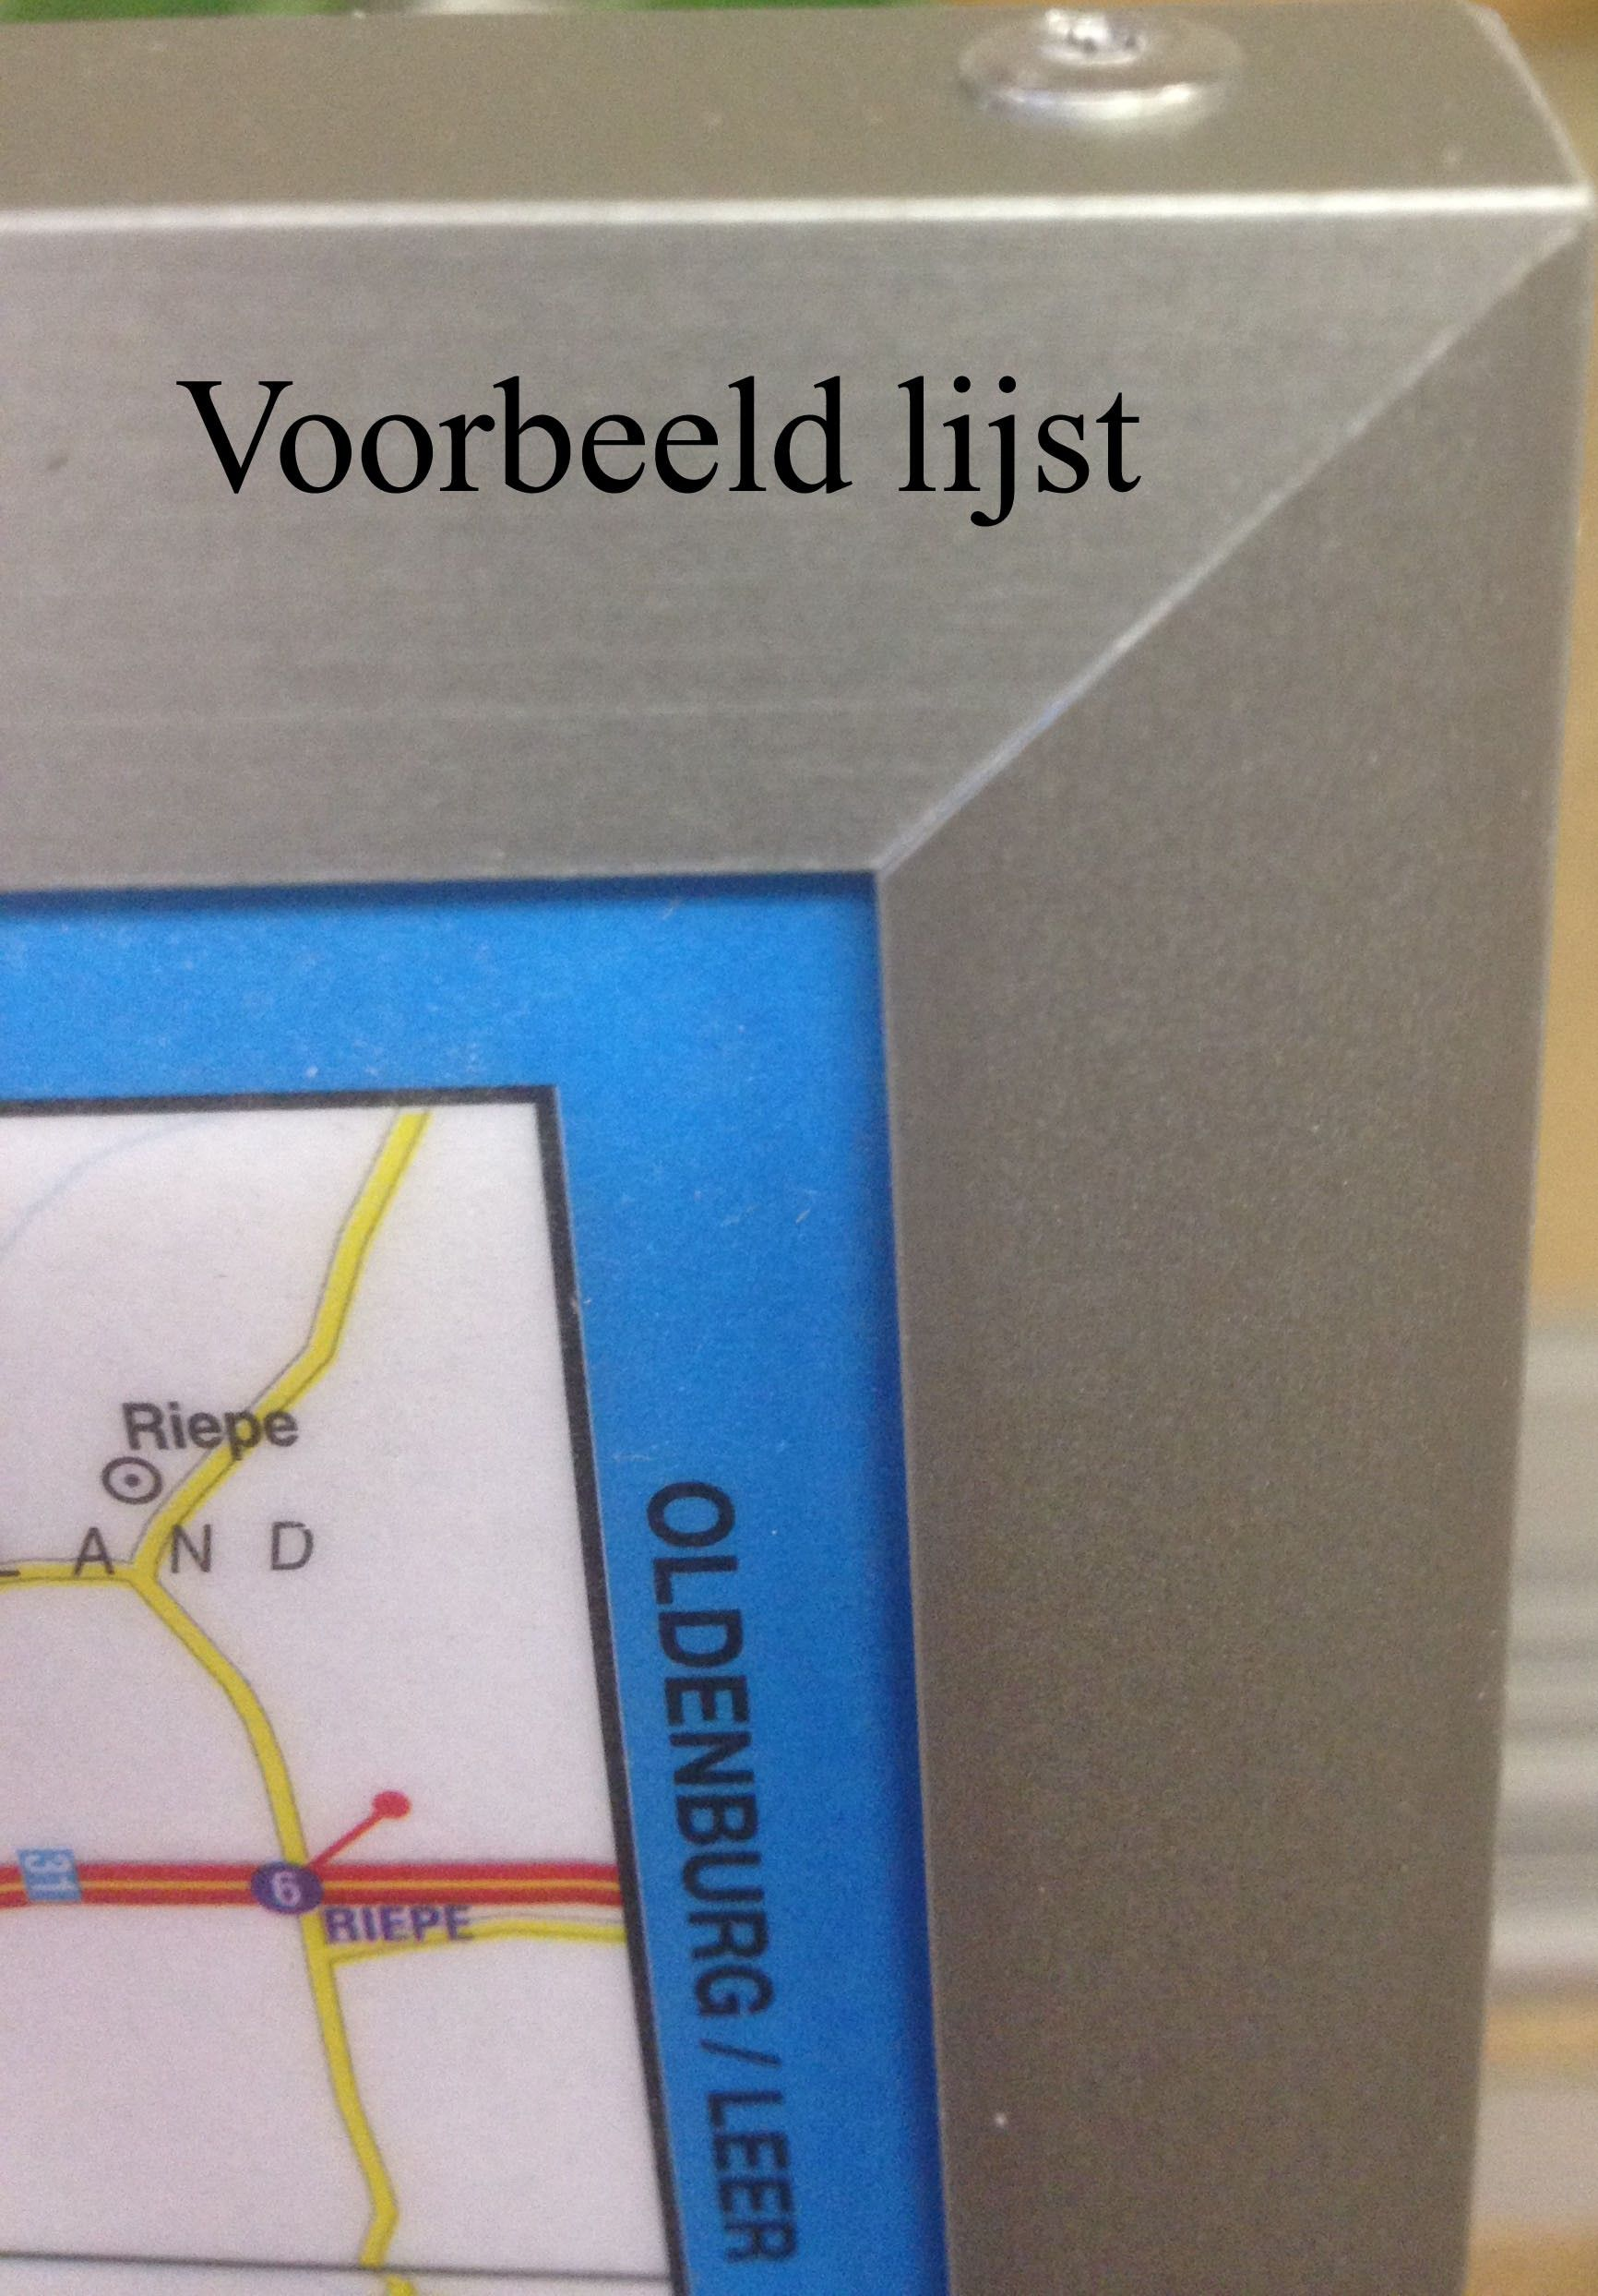 Provincie kaart Zuid-Holland